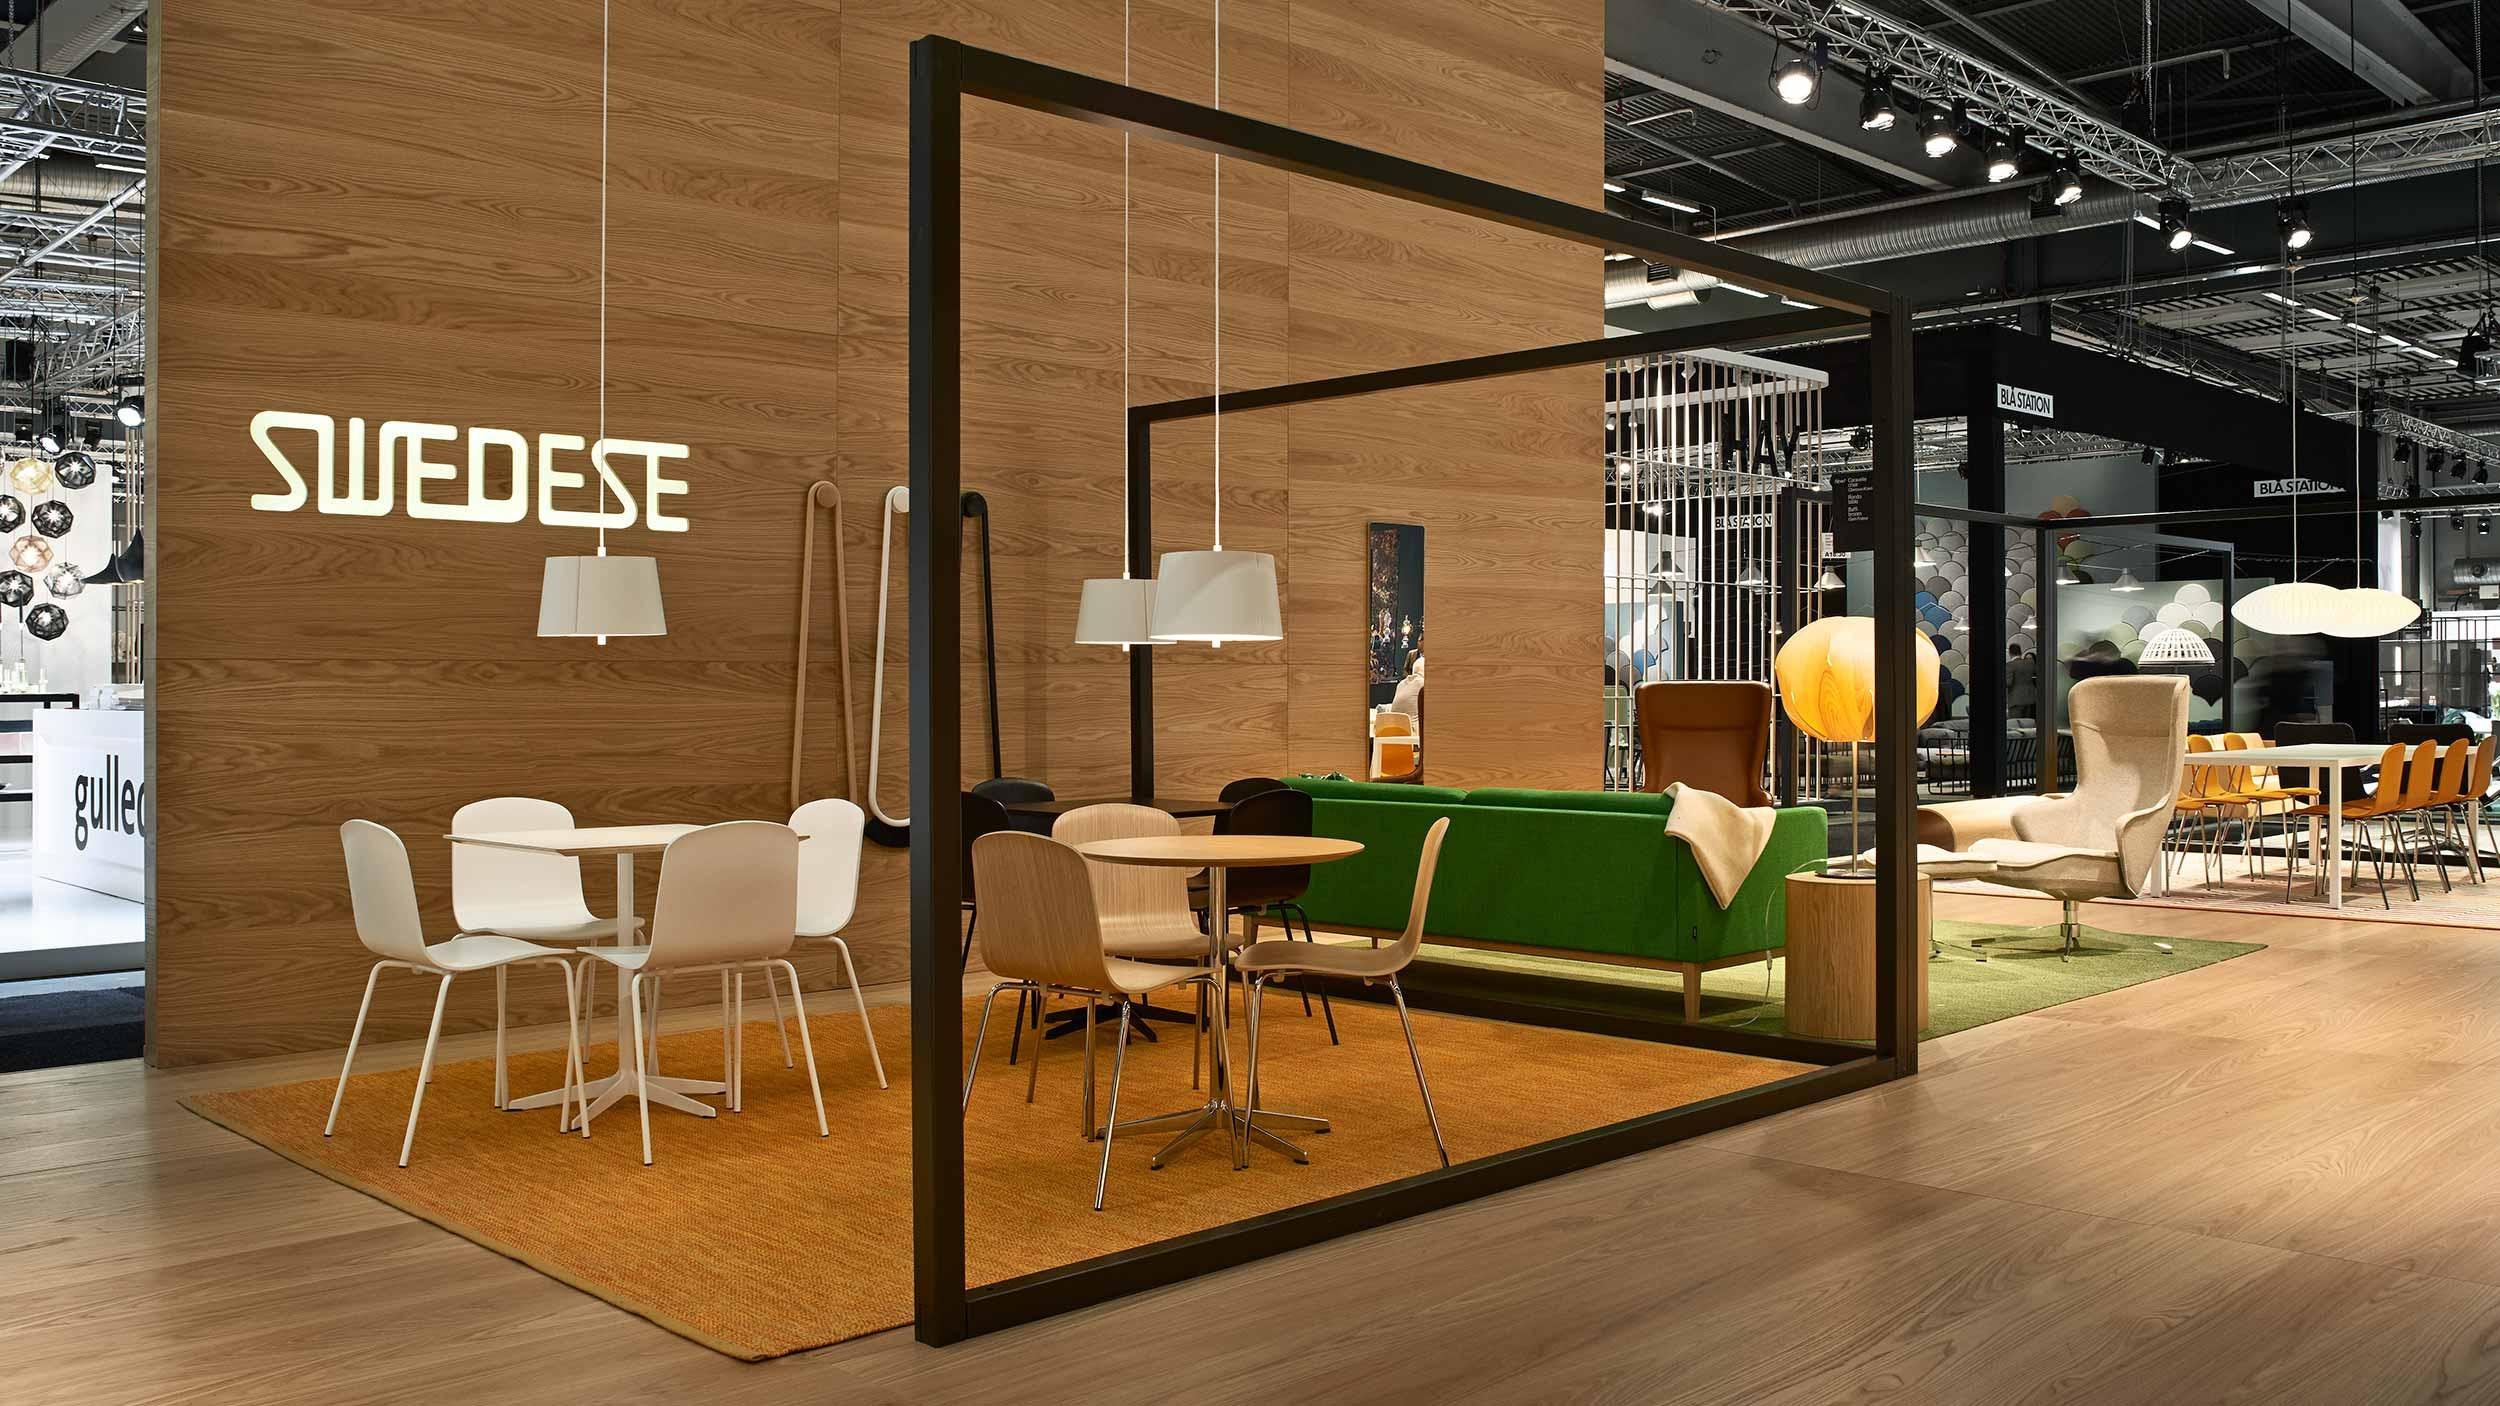 Swedese – exhibition concept